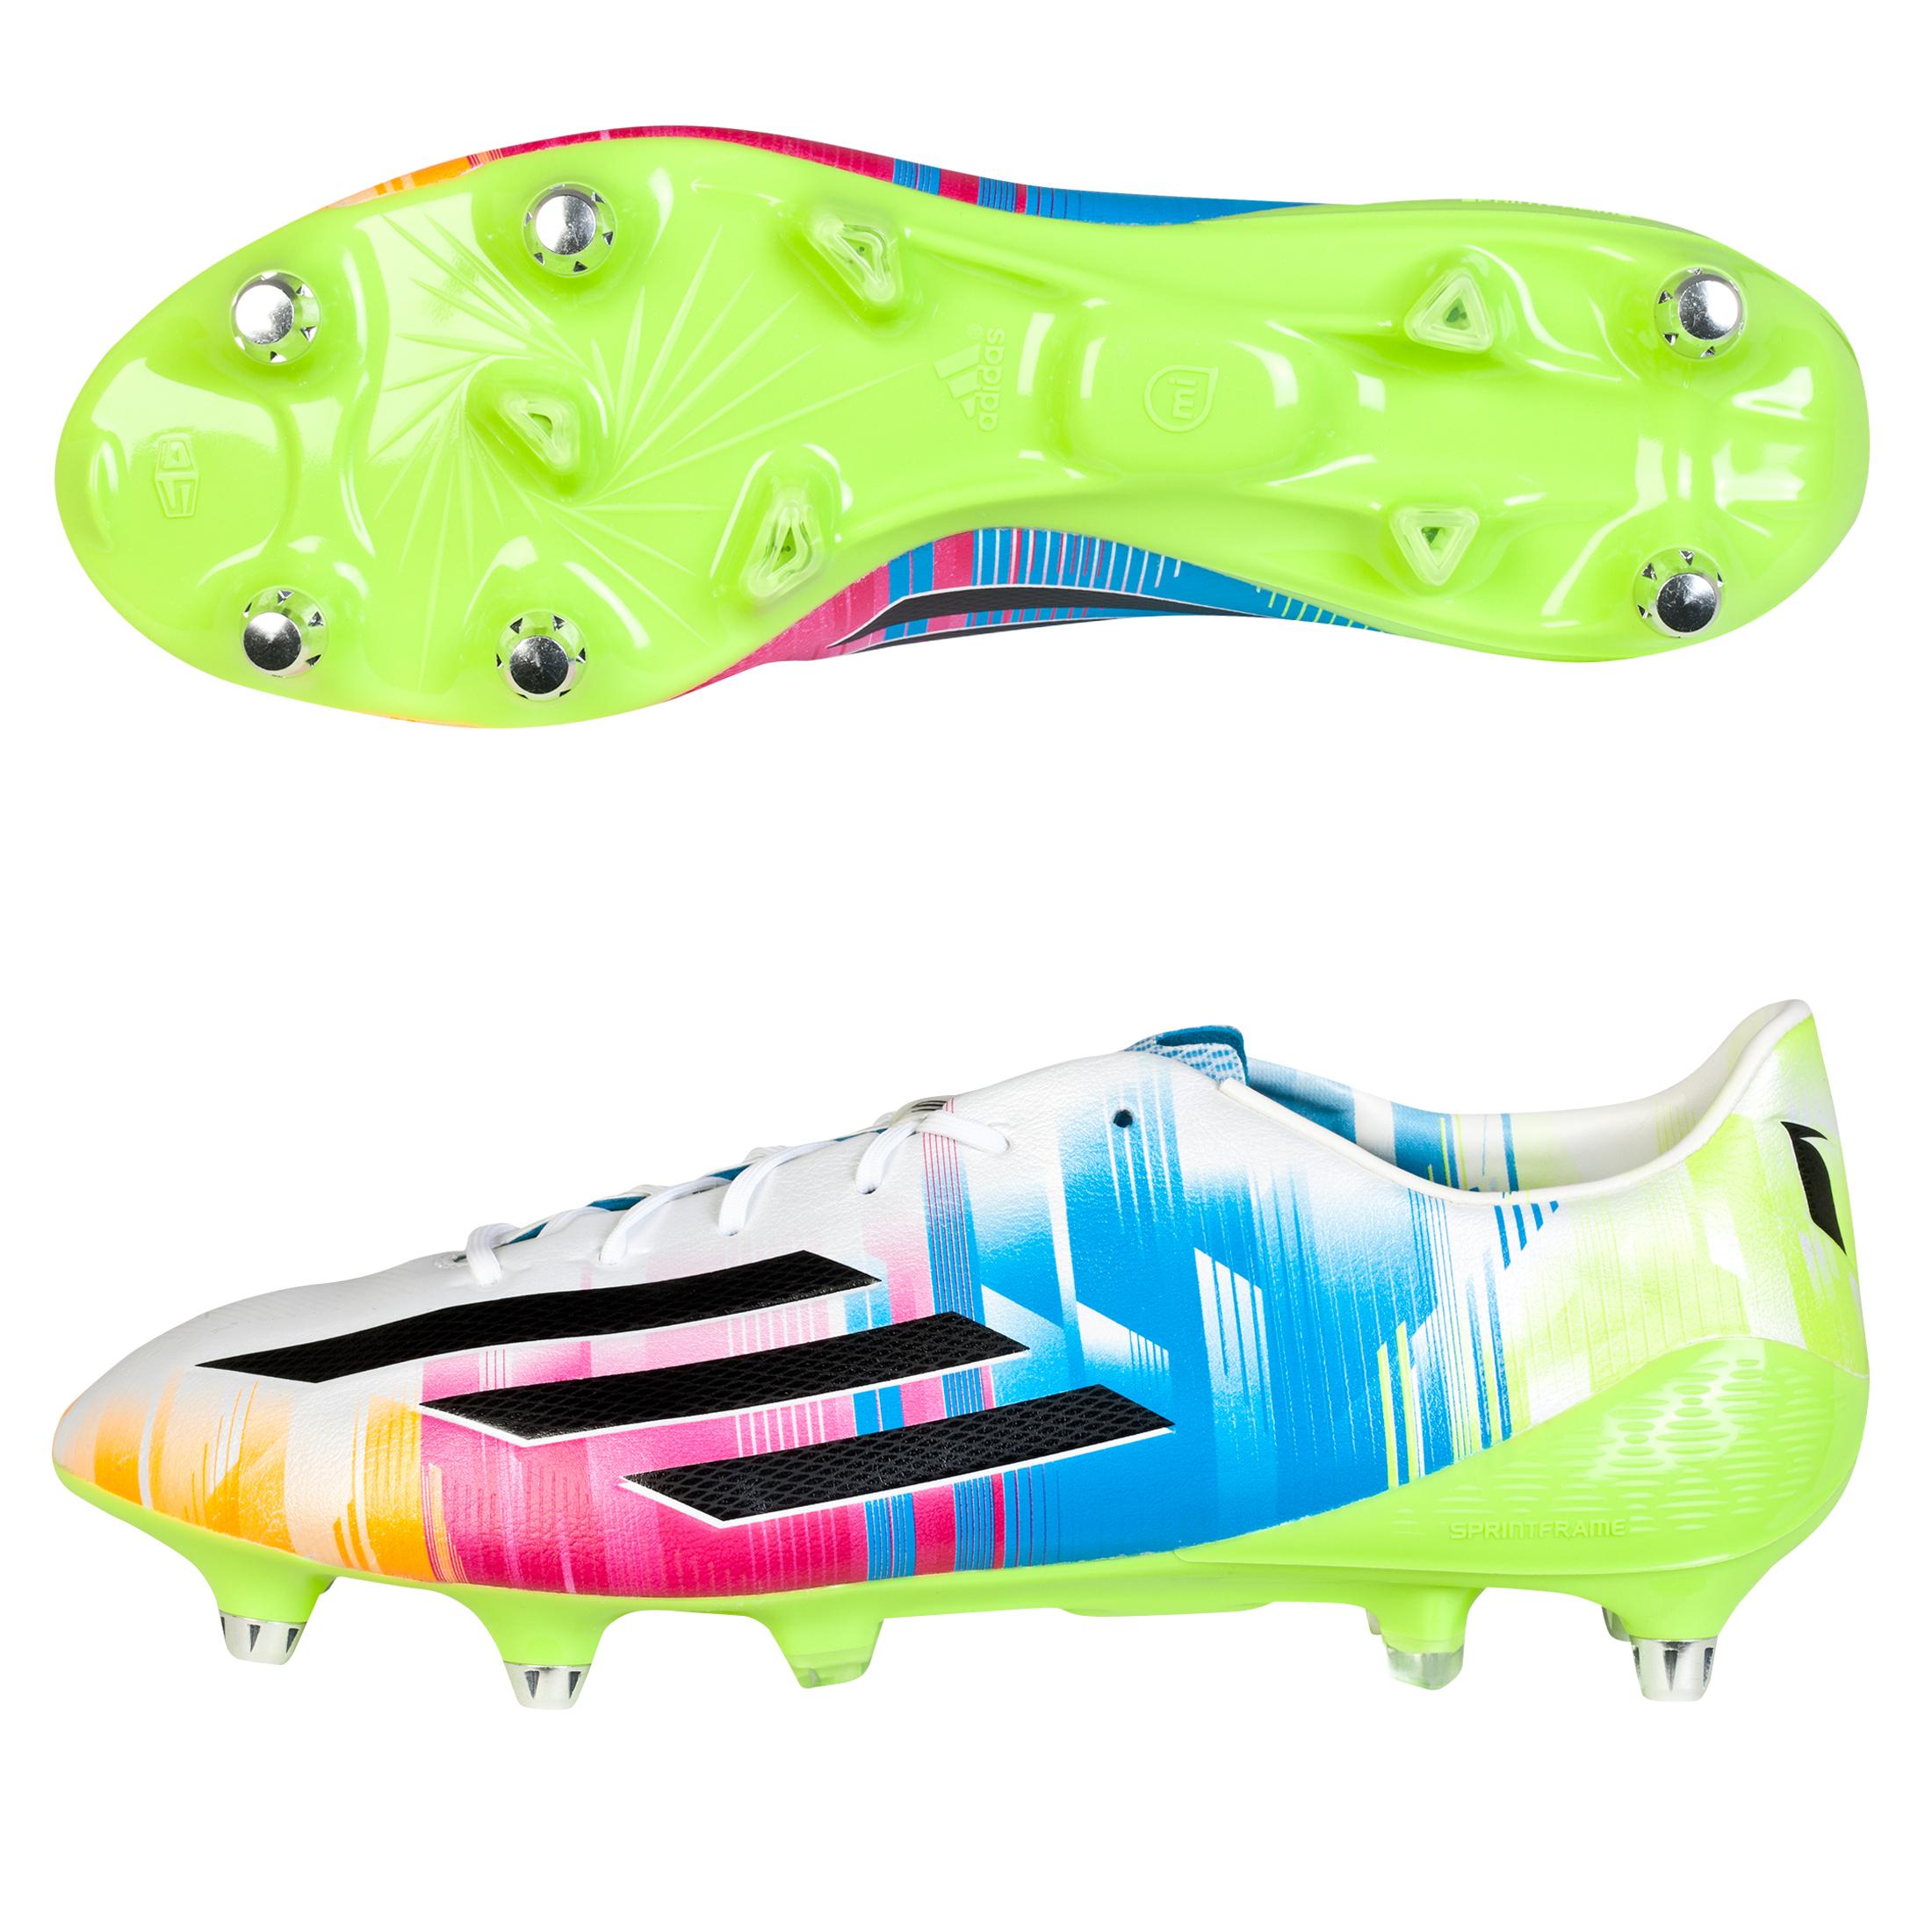 Adidas F50 adiZero Messi XTRX Soft Ground Football Boots White